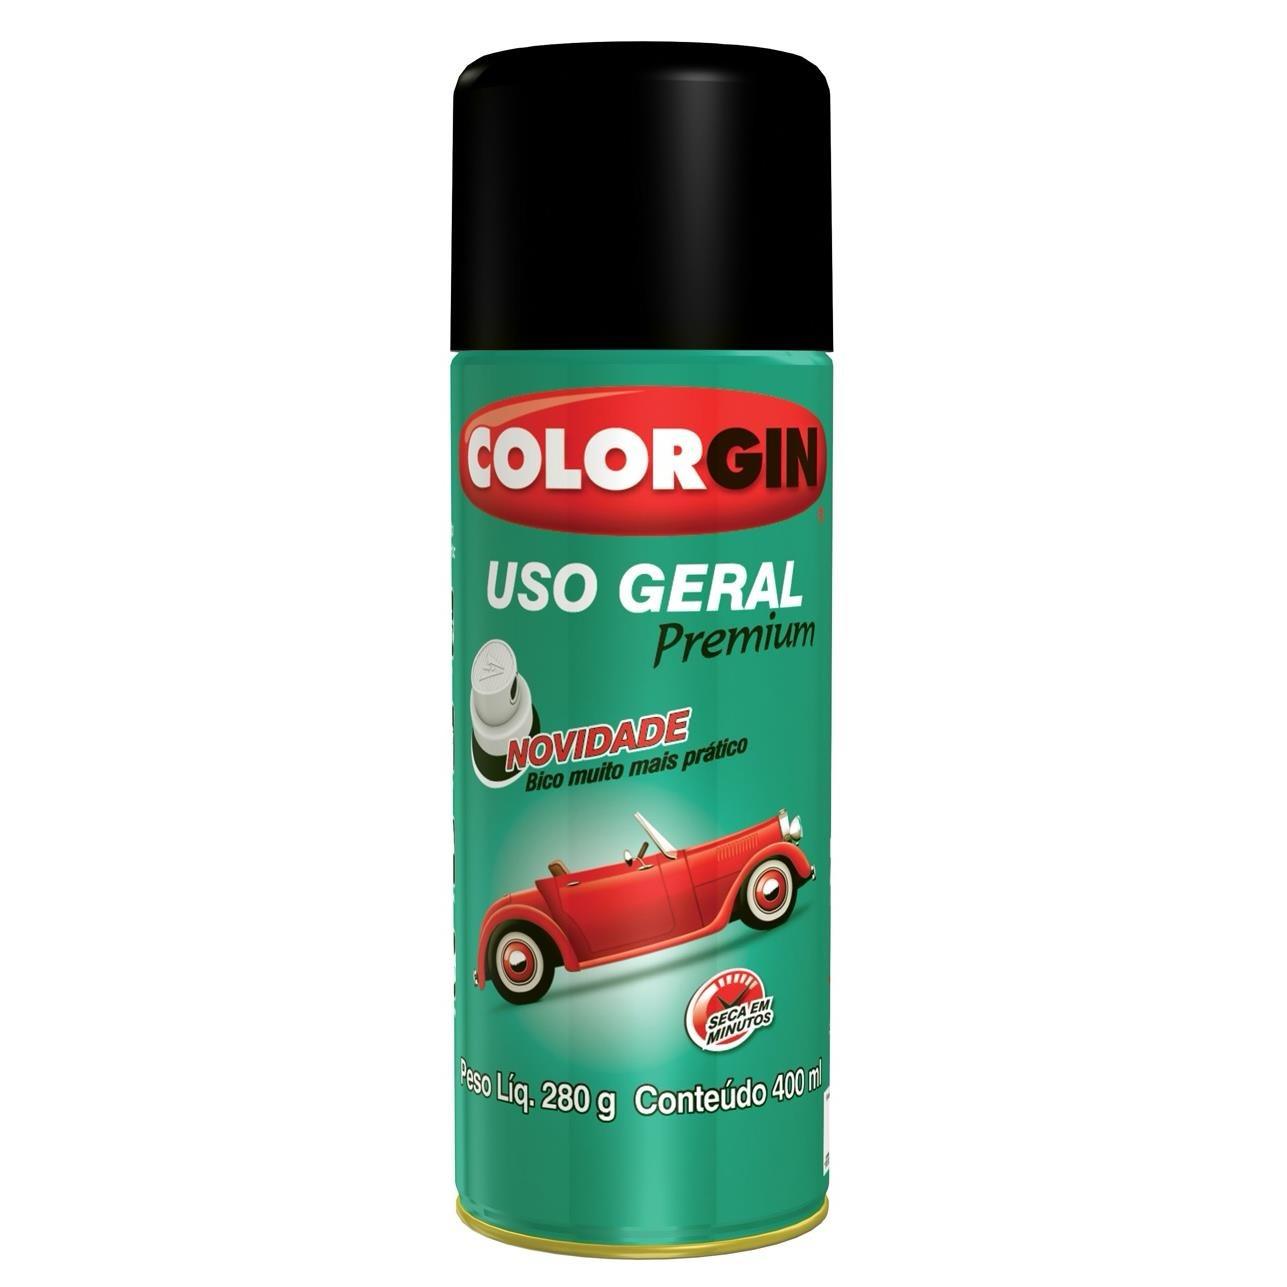 Tinta Spray Brilhante Uso geral Interno e Externo - Grafite Para Rodas - 400ml - Colorgin